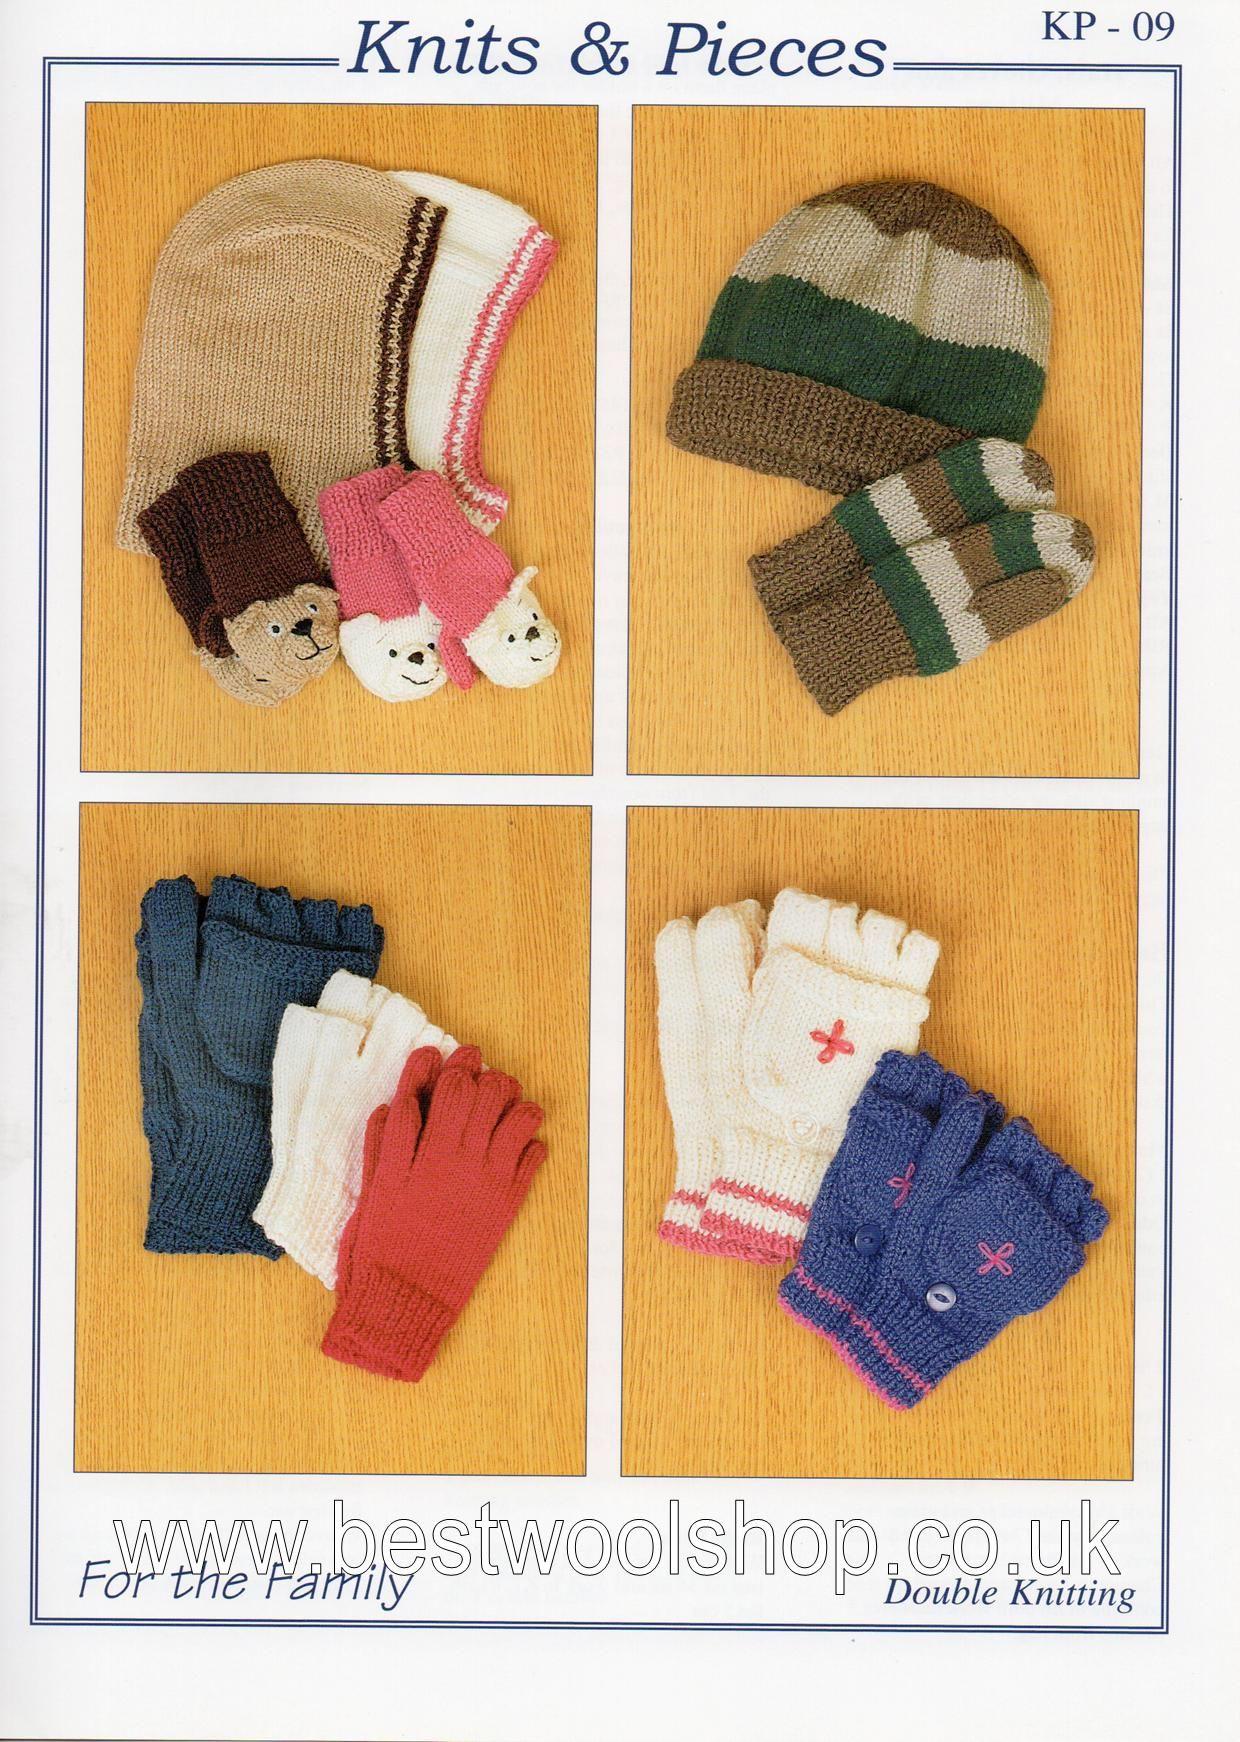 Knitting Pattern Balaclava Kp 09 Knits Pieces Balaclava Teddy Mittens Hat Fingerless